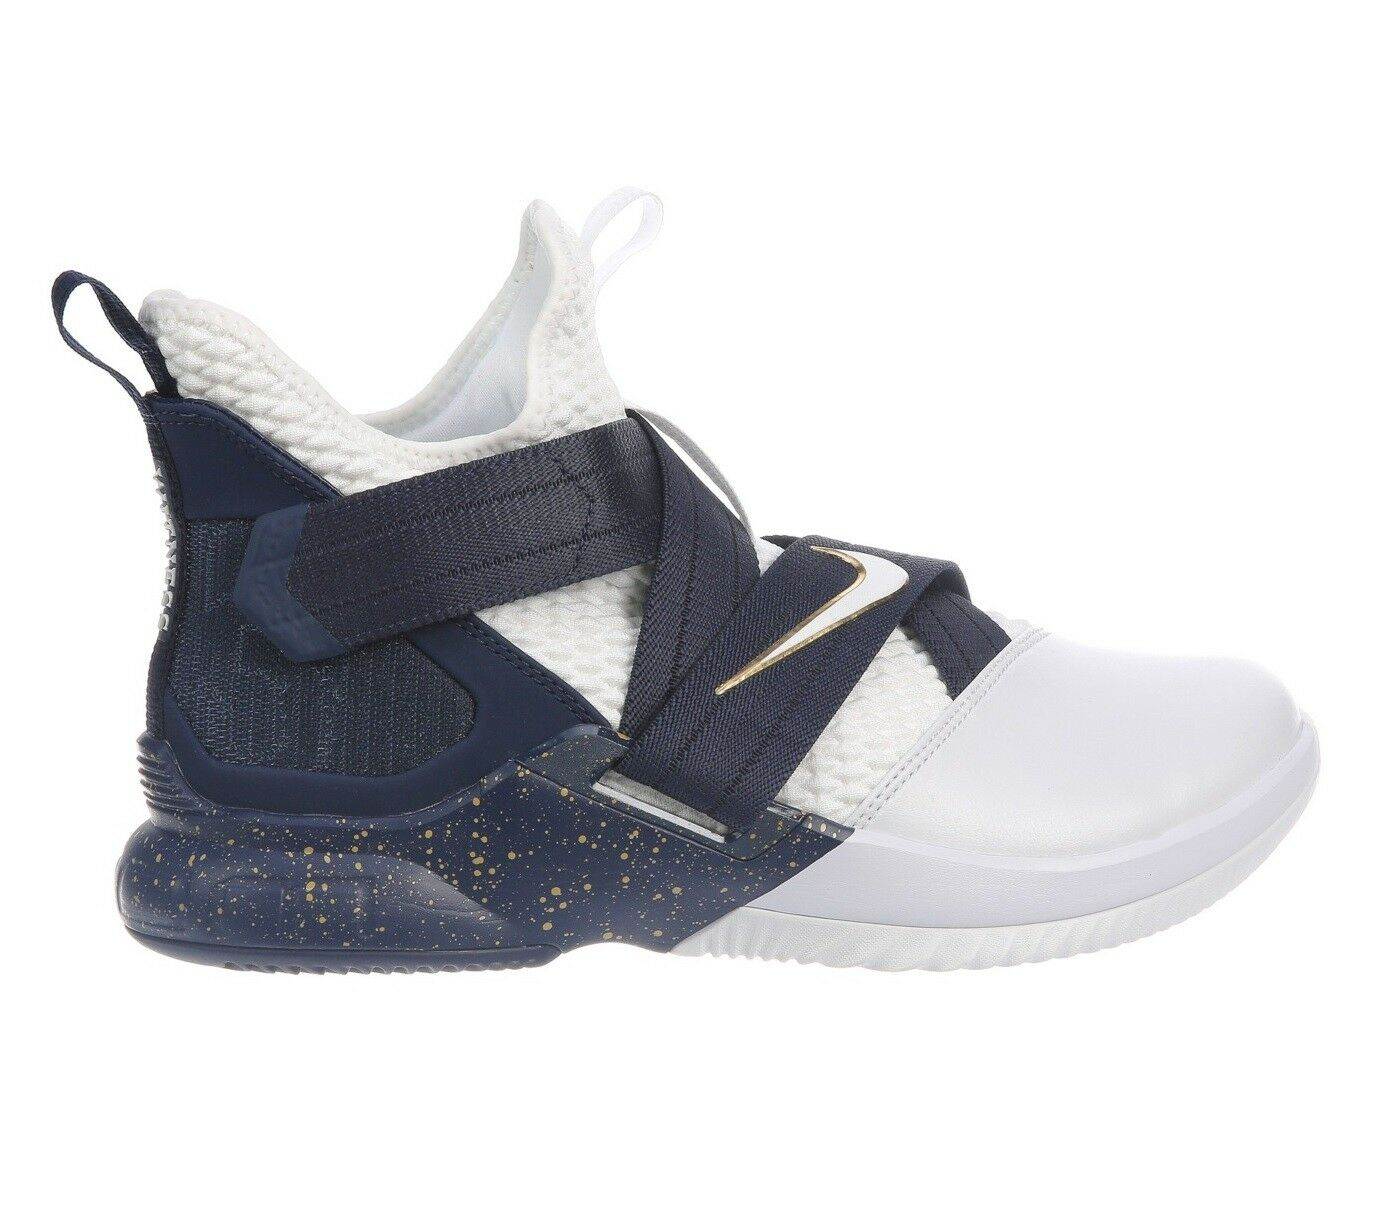 brand new 96a78 929d4 Nike lebron soldato 12 sfg sfg 12 testimone Uomo ao4054-100 della marina  bianca scorpe 9,5